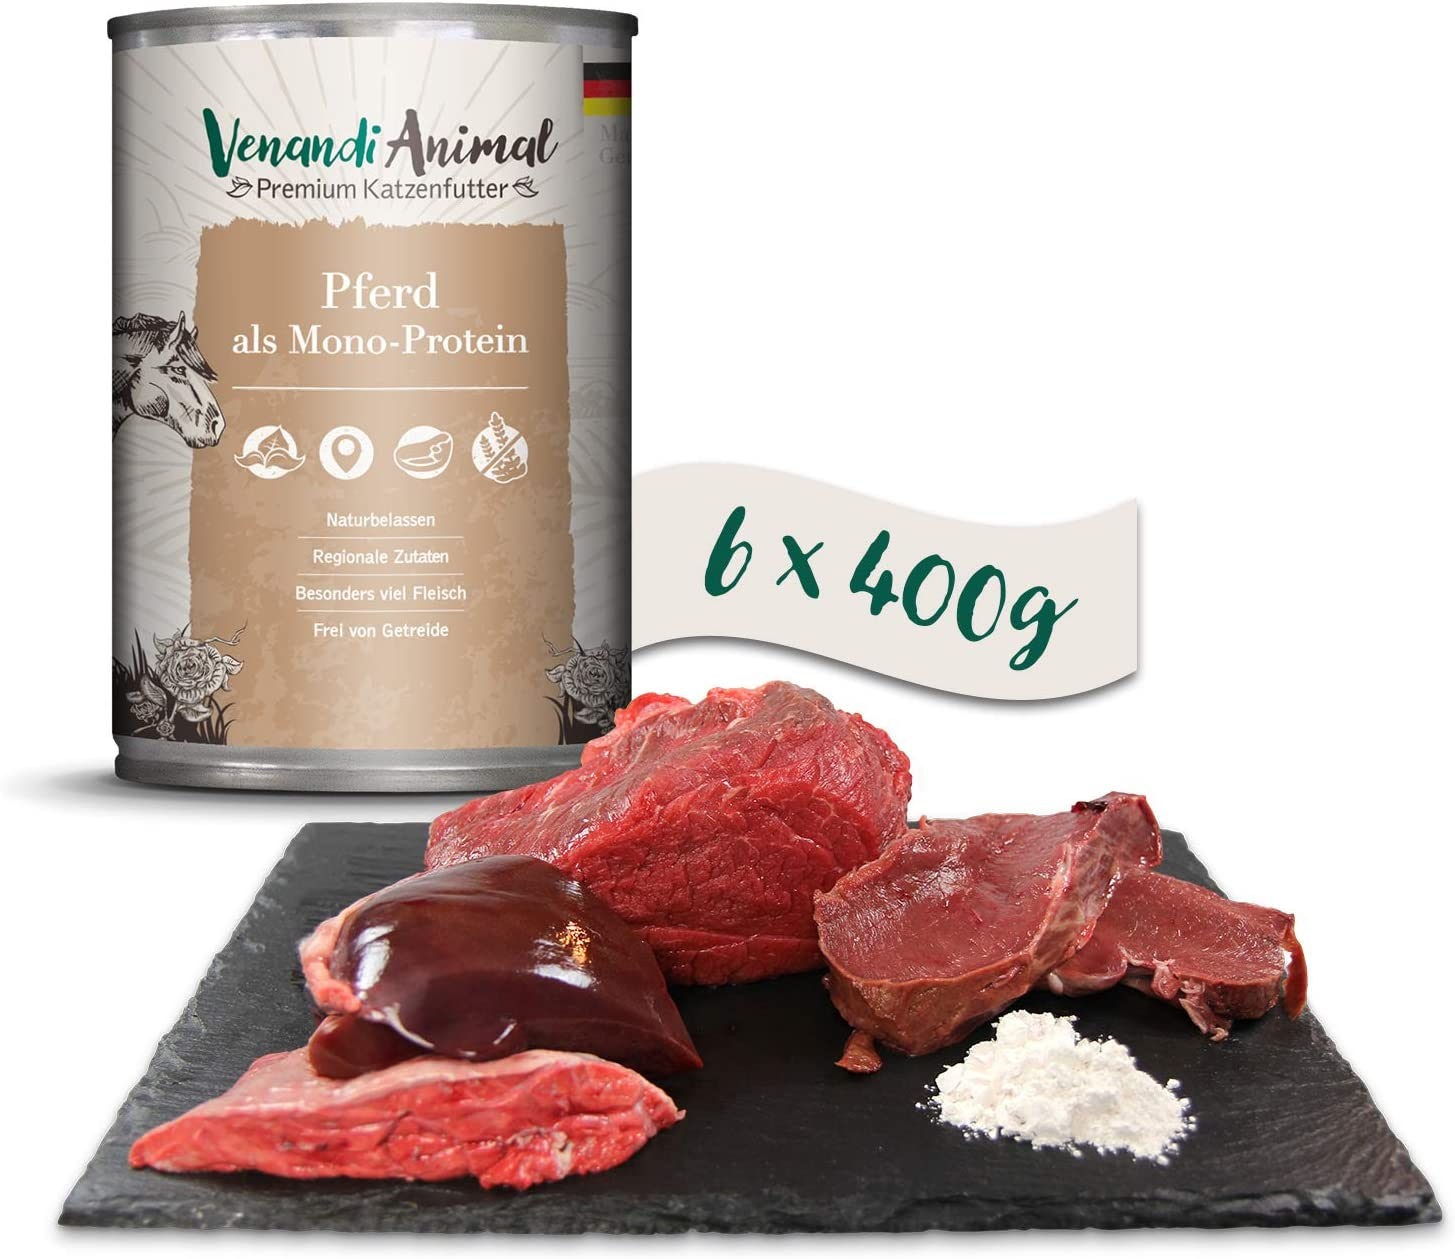 Venandi Animal - Pienso Premium para Gatos - Caballo como monoproteína - Completamente Libre de Cereales - 6 x 400 g